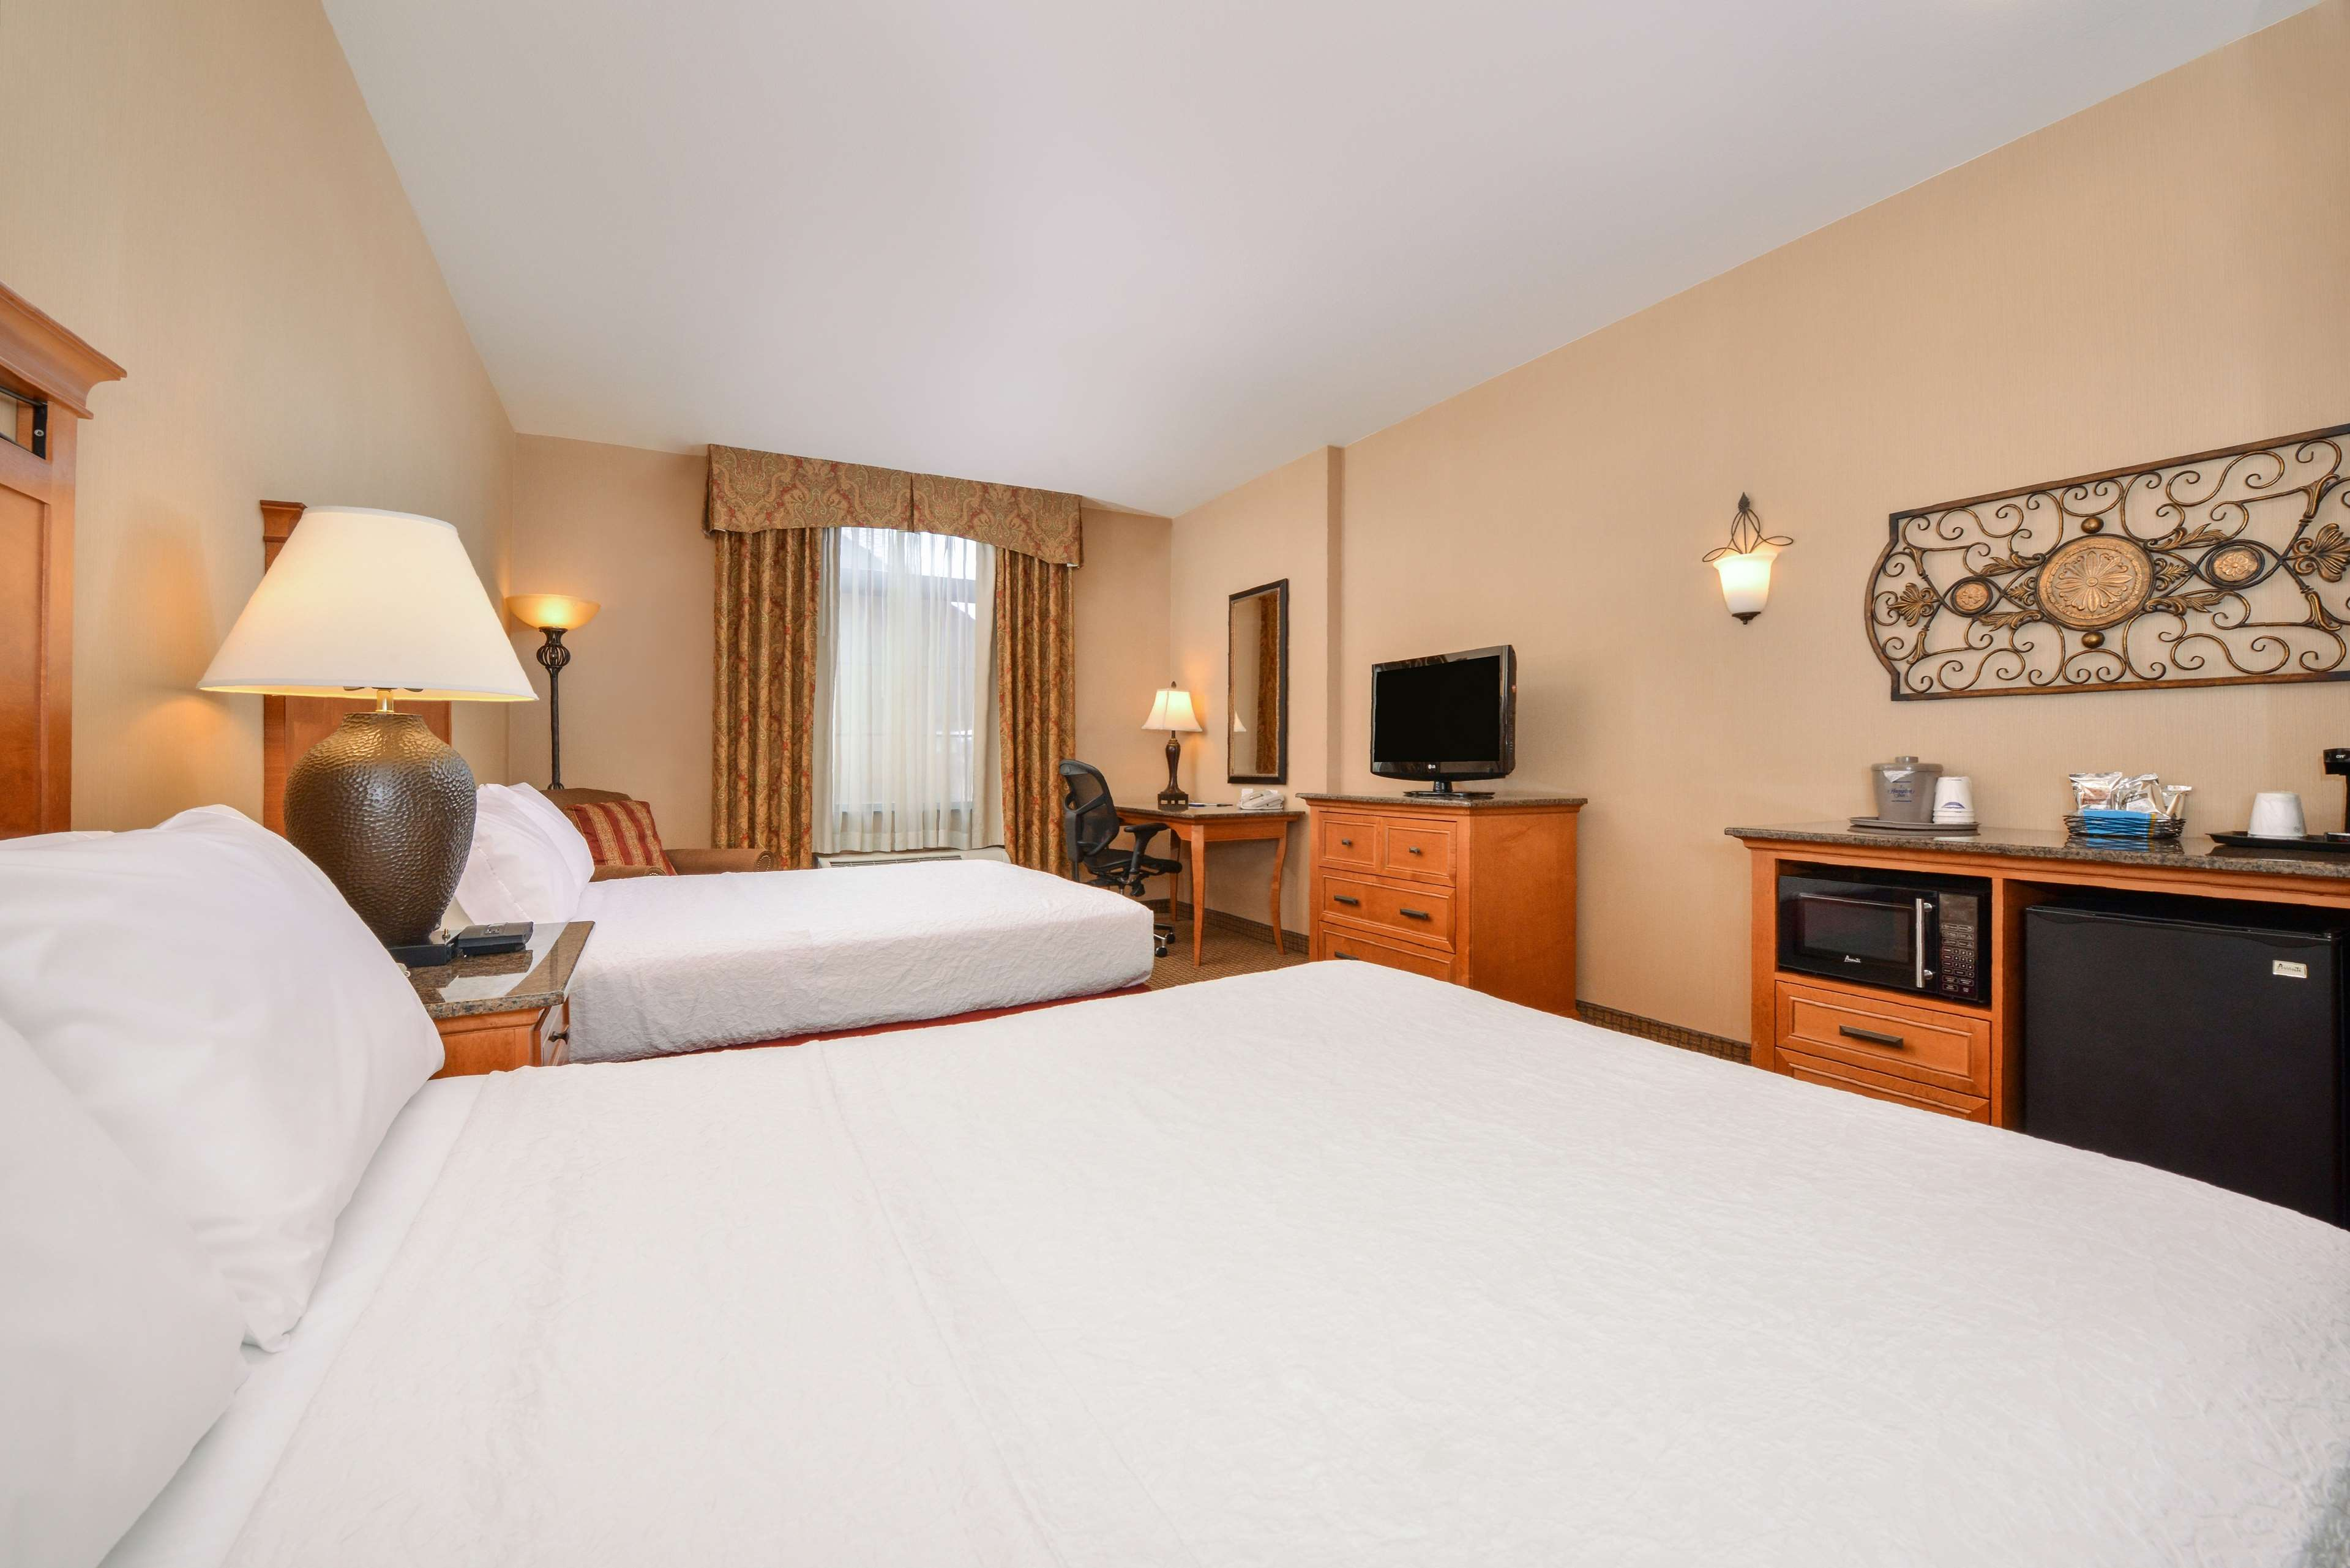 Hampton Inn & Suites Coeur d' Alene image 17